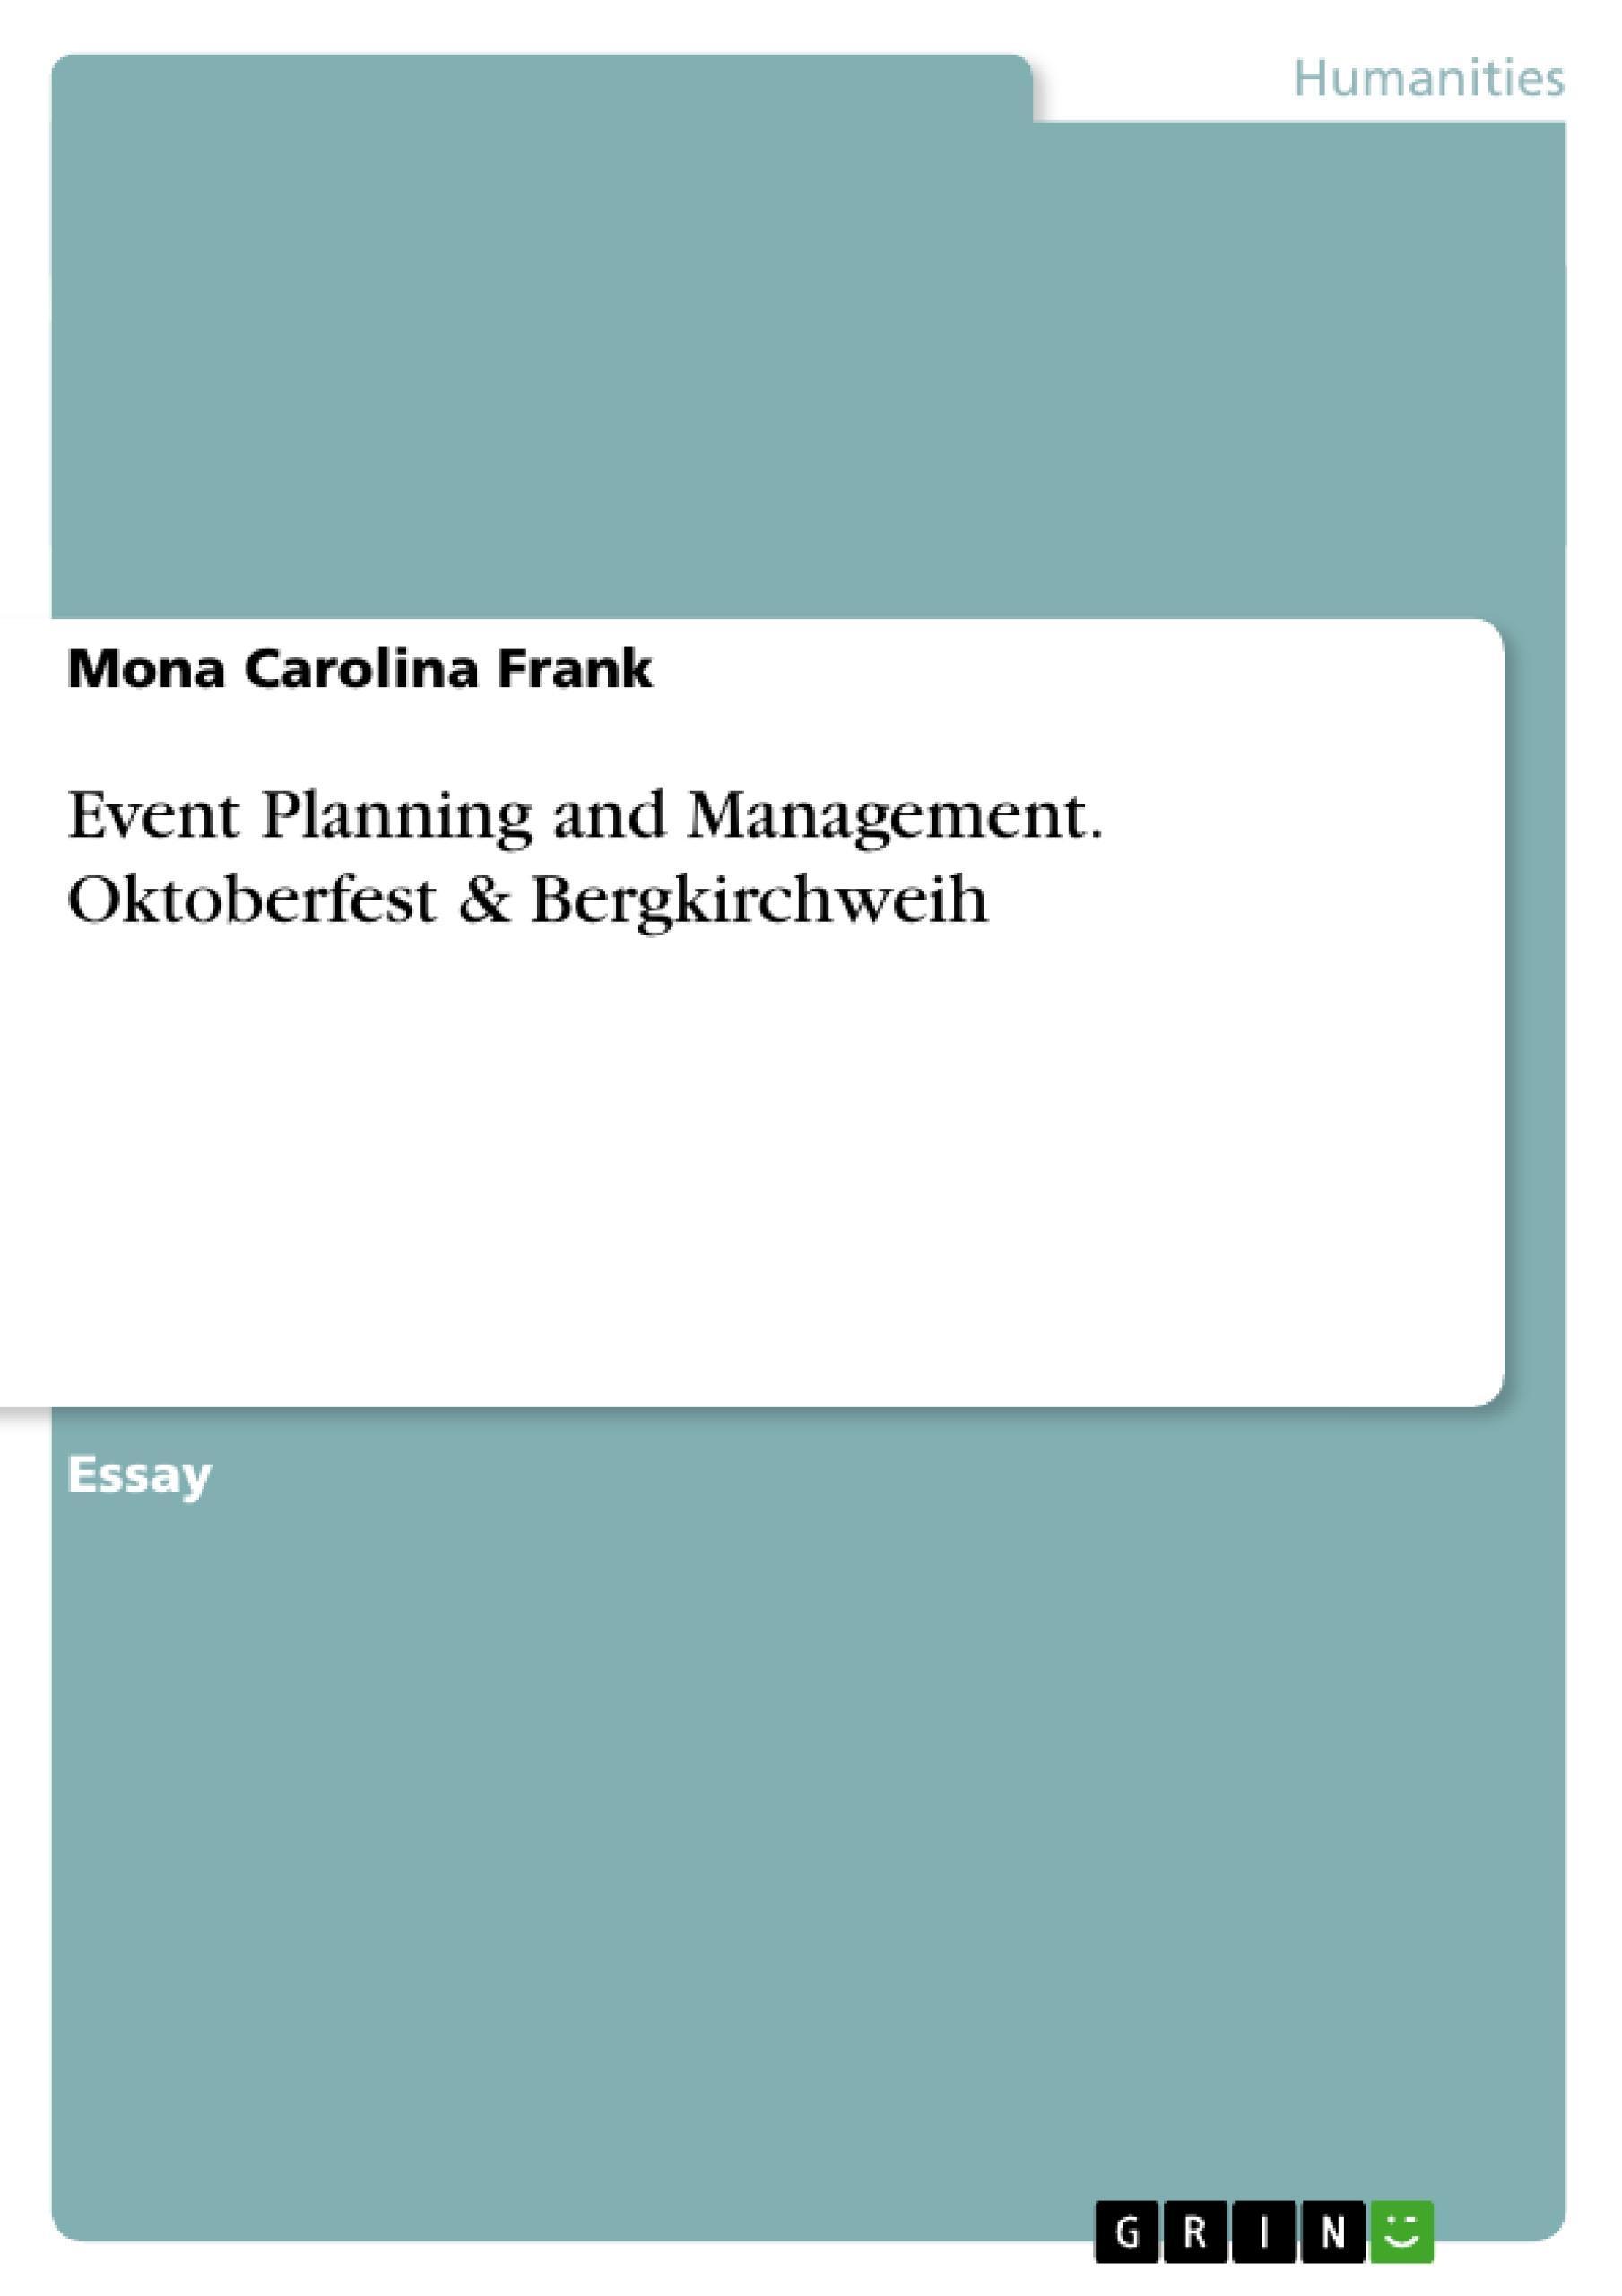 Event Planning and Management. Oktoberfest & Bergkirchweih Mona Carolina Fr ...